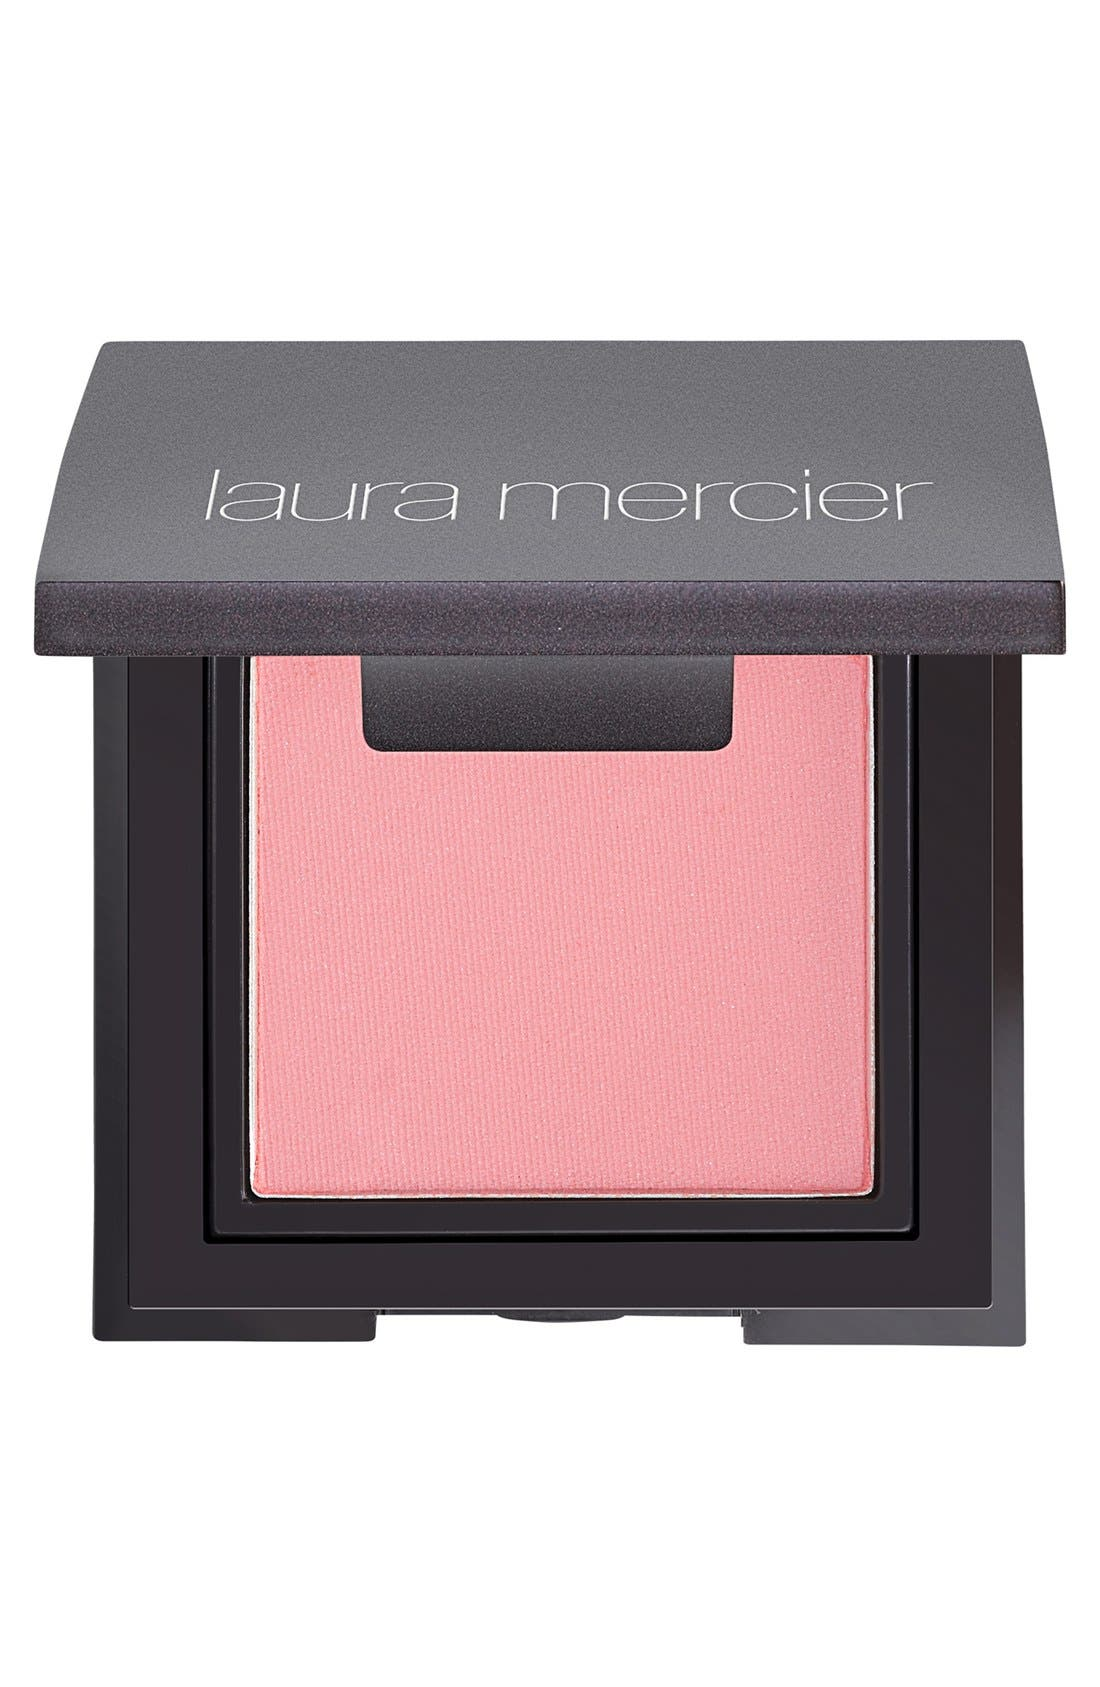 Laura Mercier 'Second Skin' Cheek Color